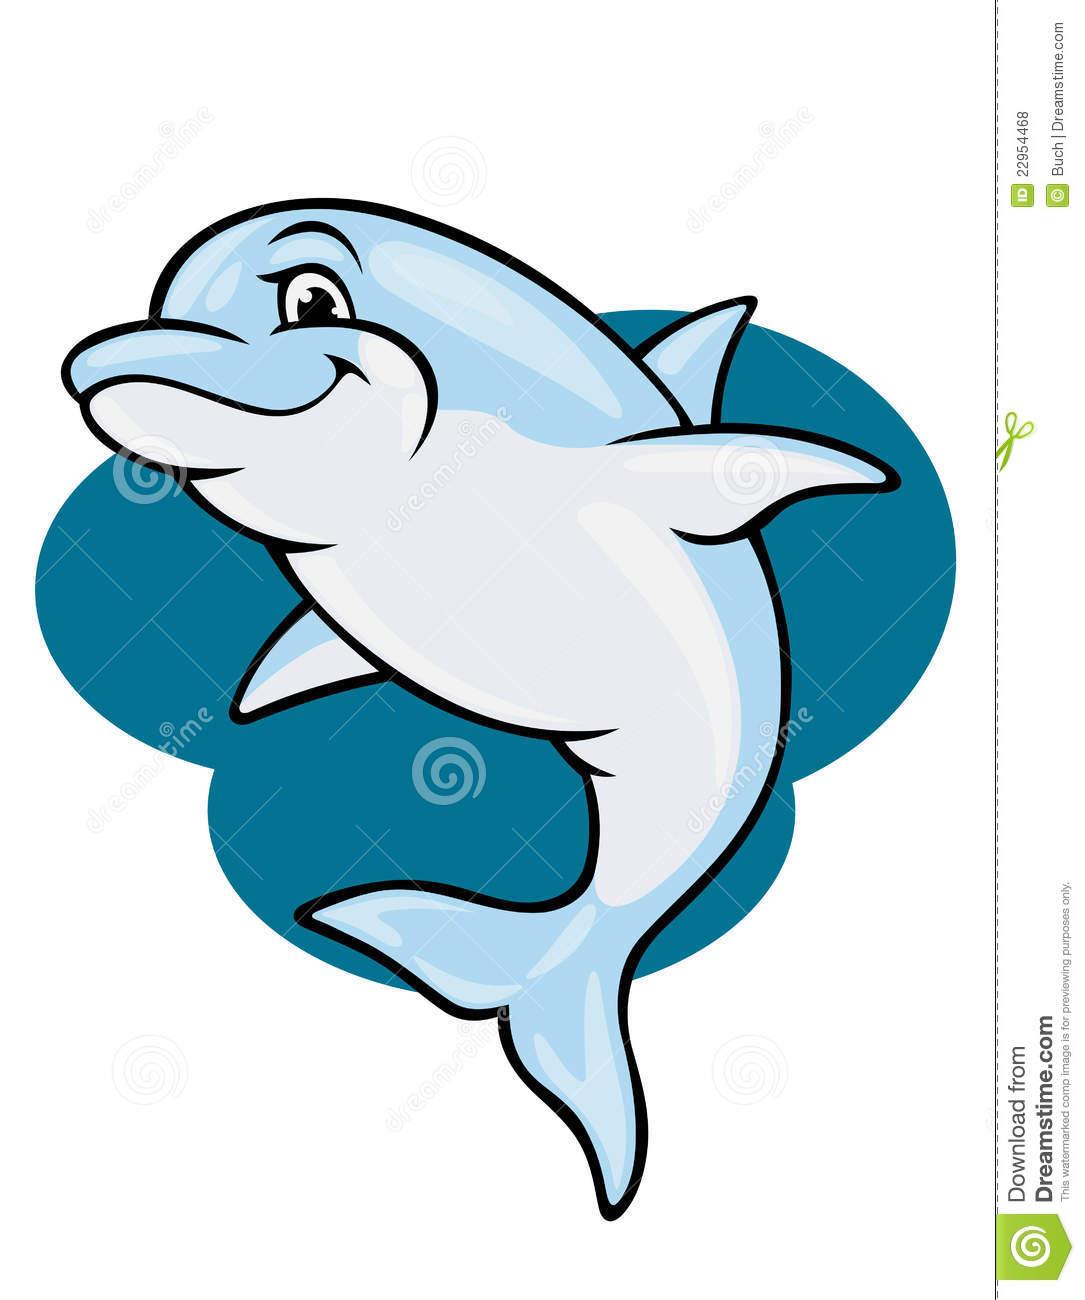 Cute Dolphin Clipart Cute .-Cute Dolphin Clipart Cute .-8